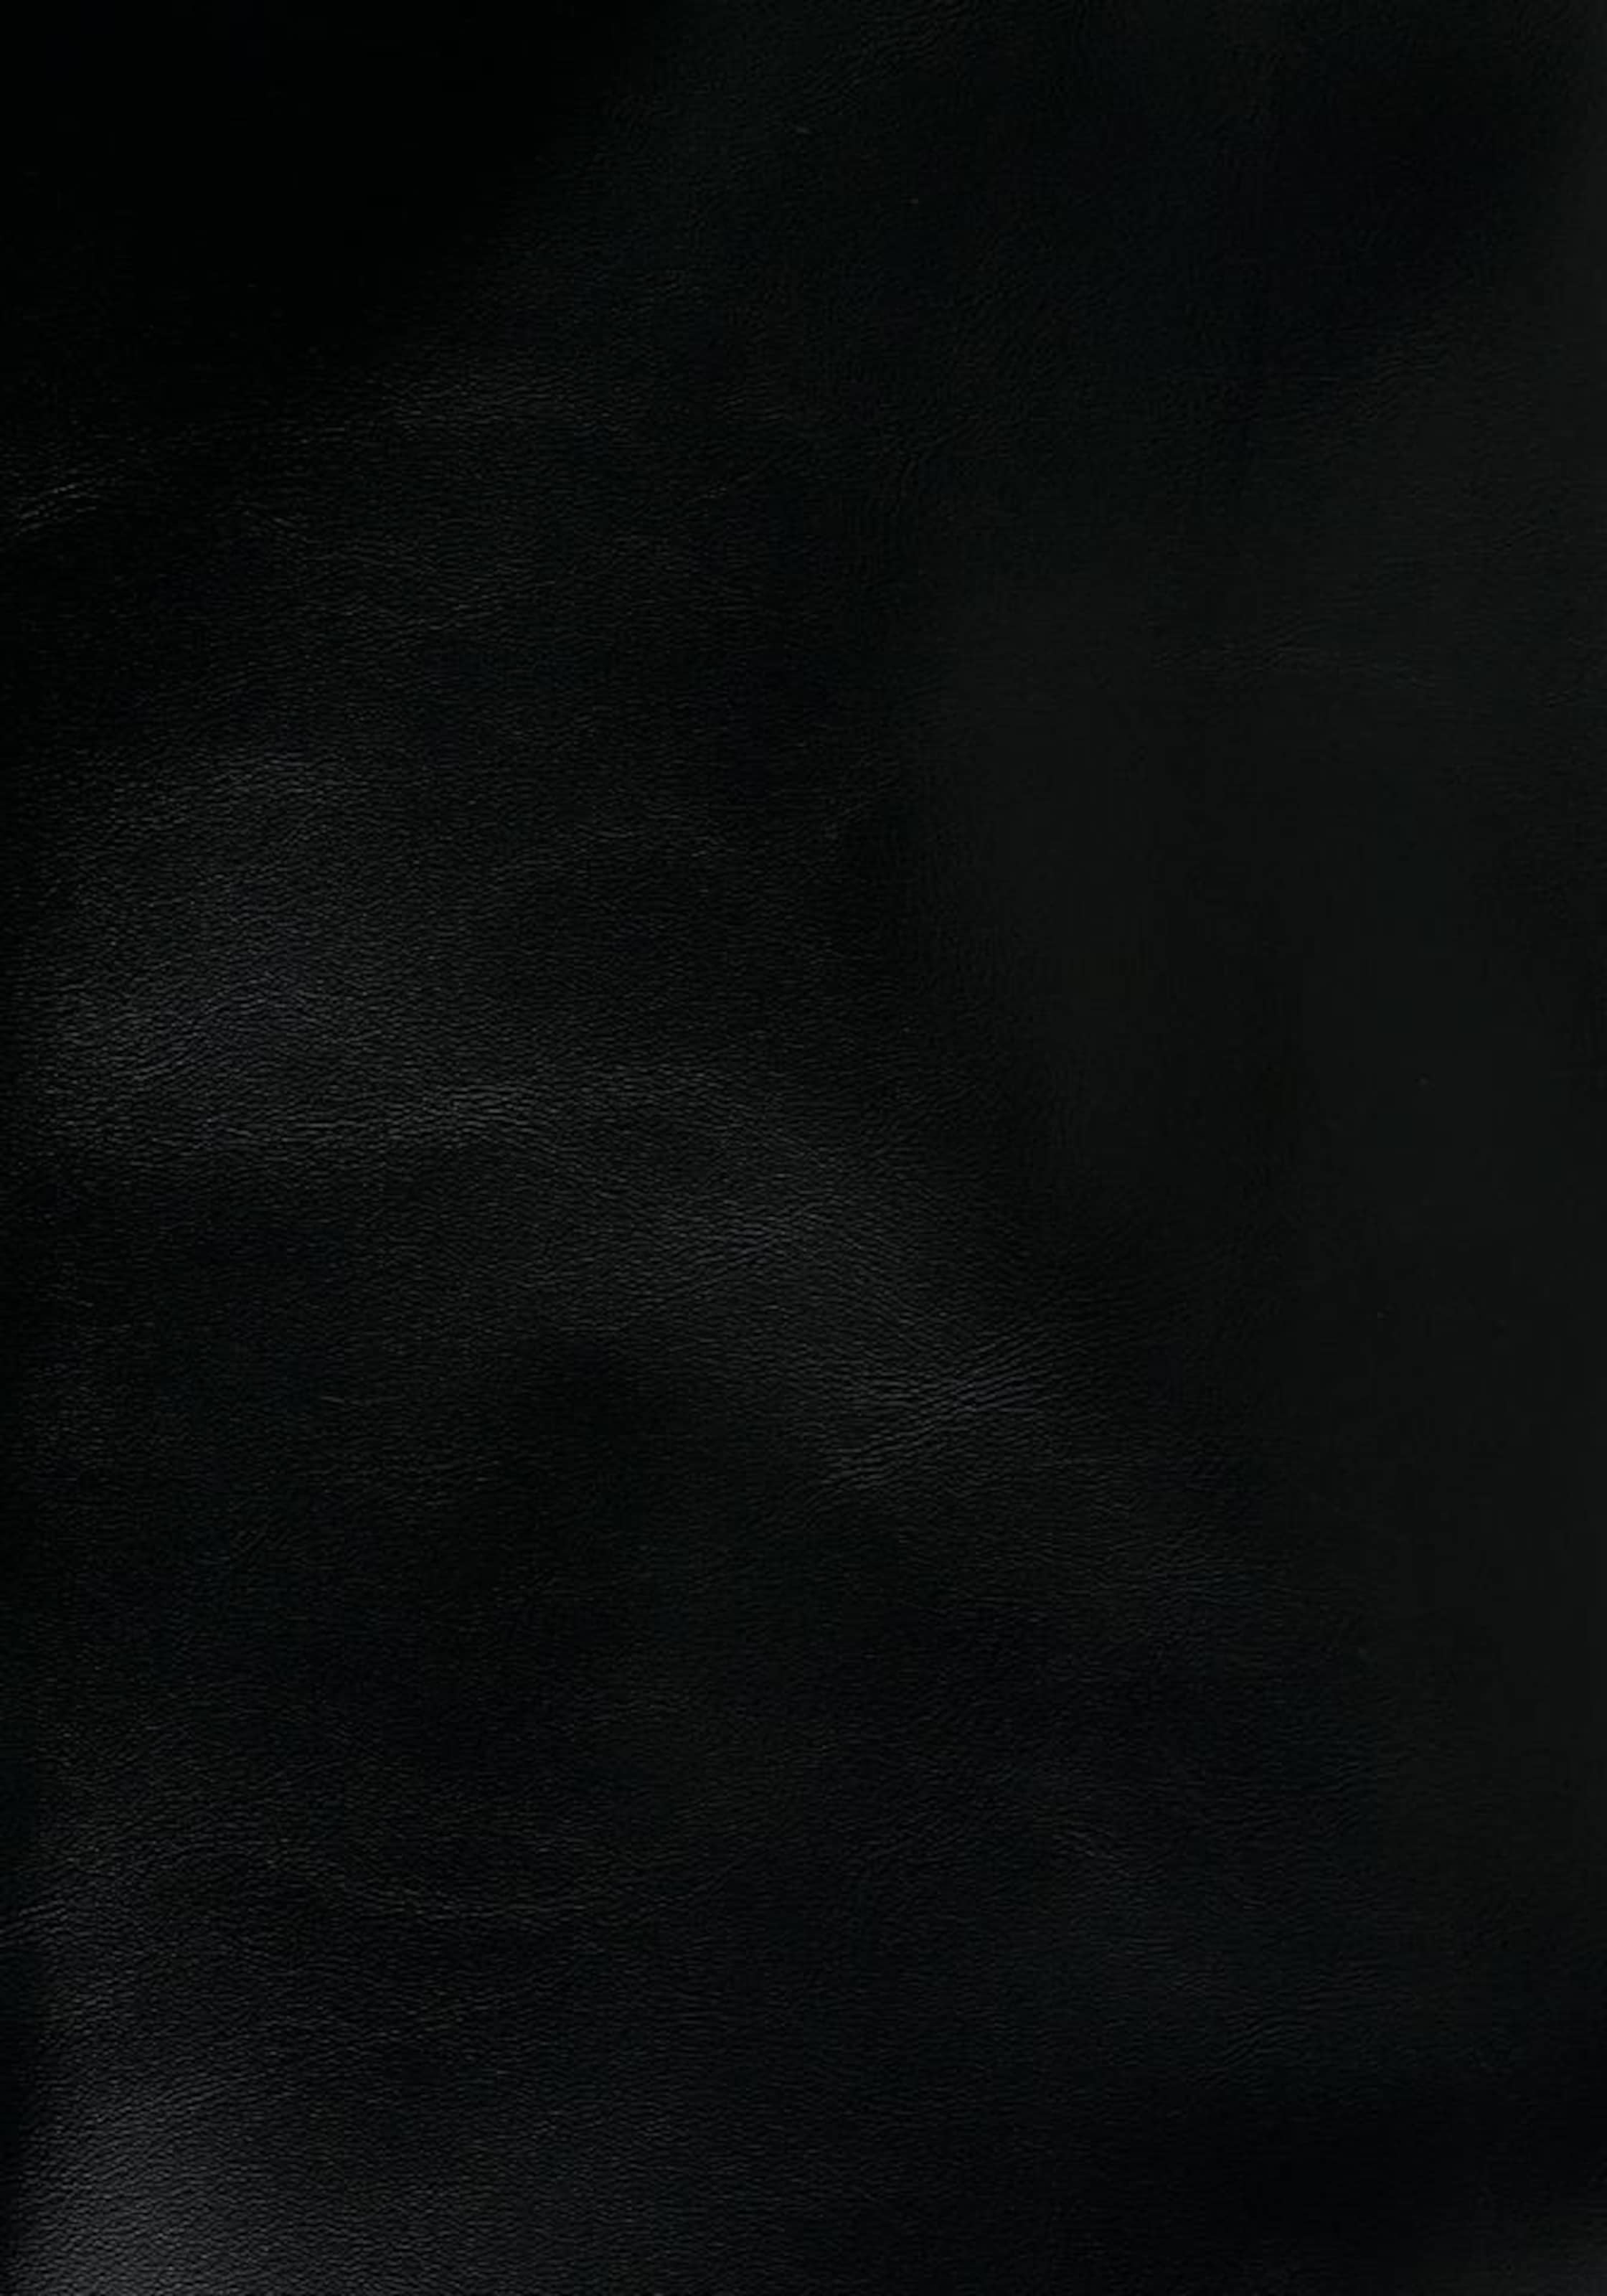 J. Jayz Shopper Billig Erkunden Bester Großhandel Günstig Online 78oZu1U